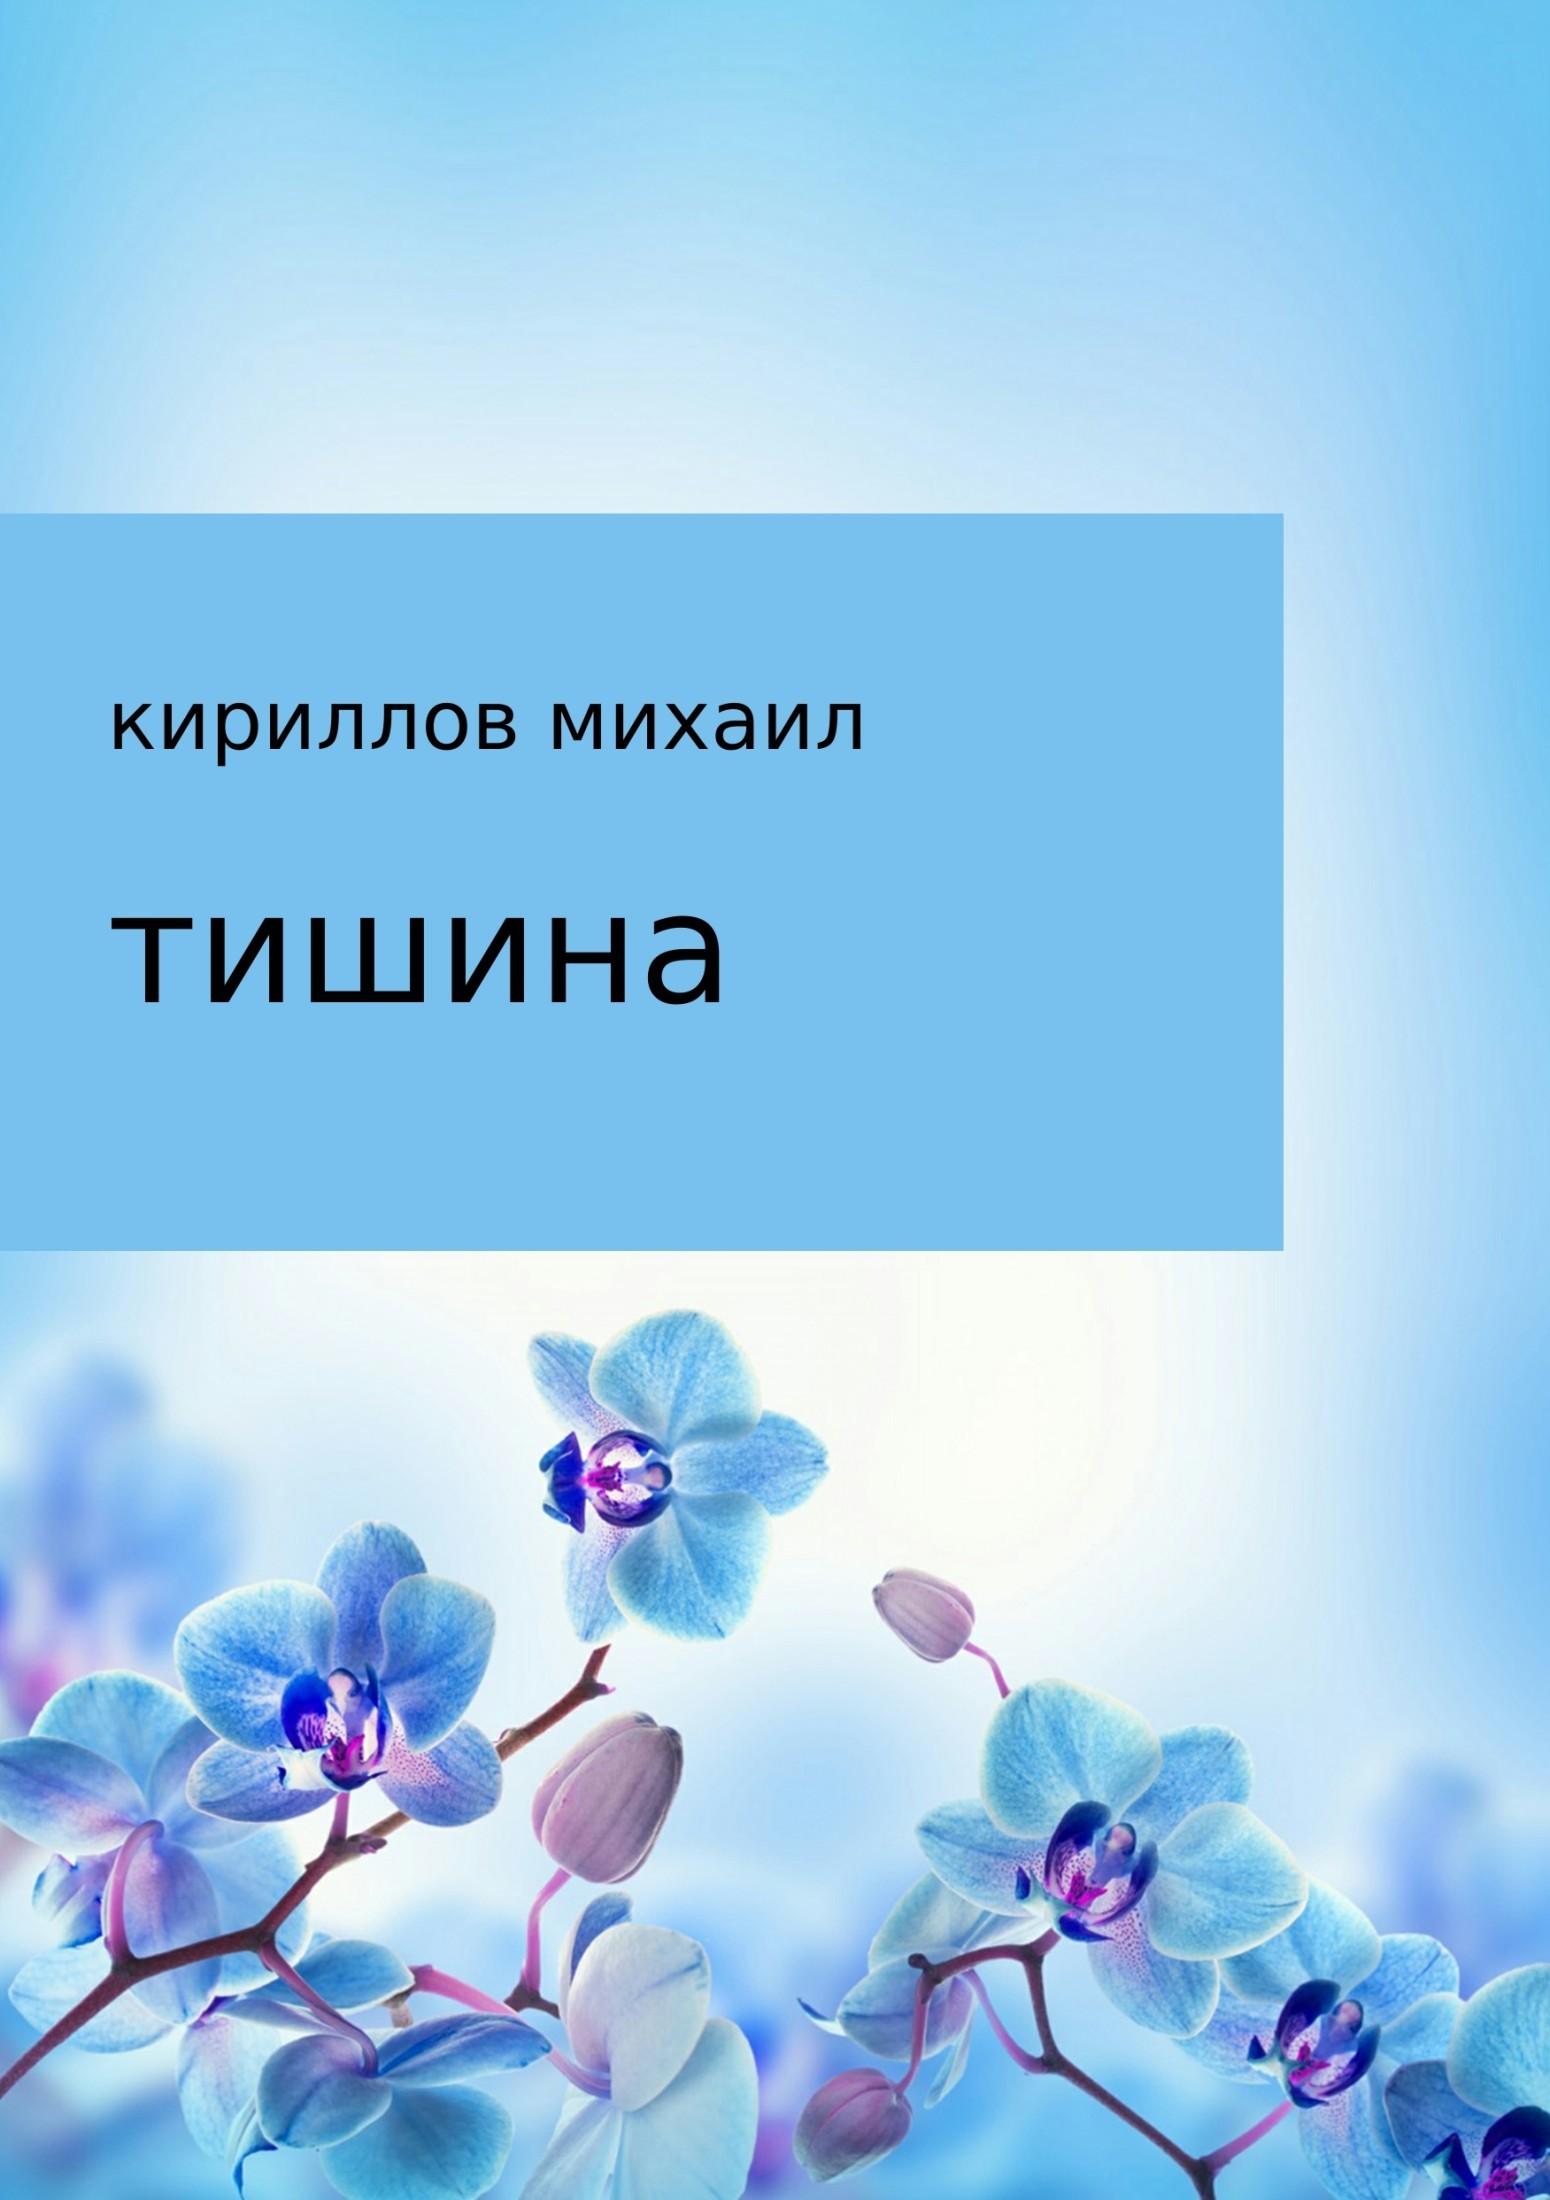 михаил владимирович кириллов Тишина василий владимирович кириллов калужские очерки